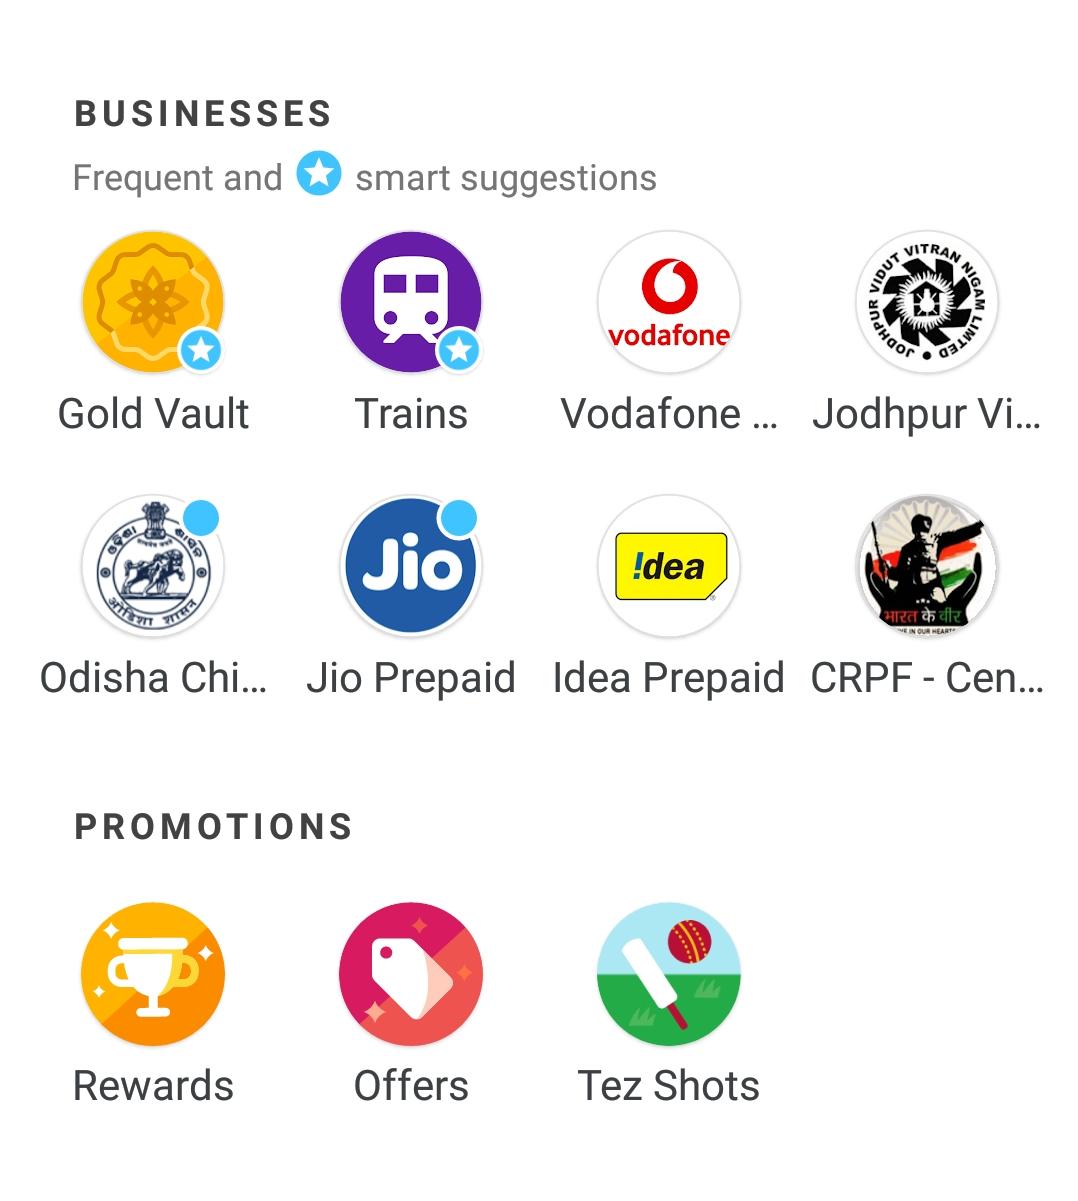 Google Pay Me Tez Shot Cricket Game Khele aur 2000 Rs tk ka Scratch